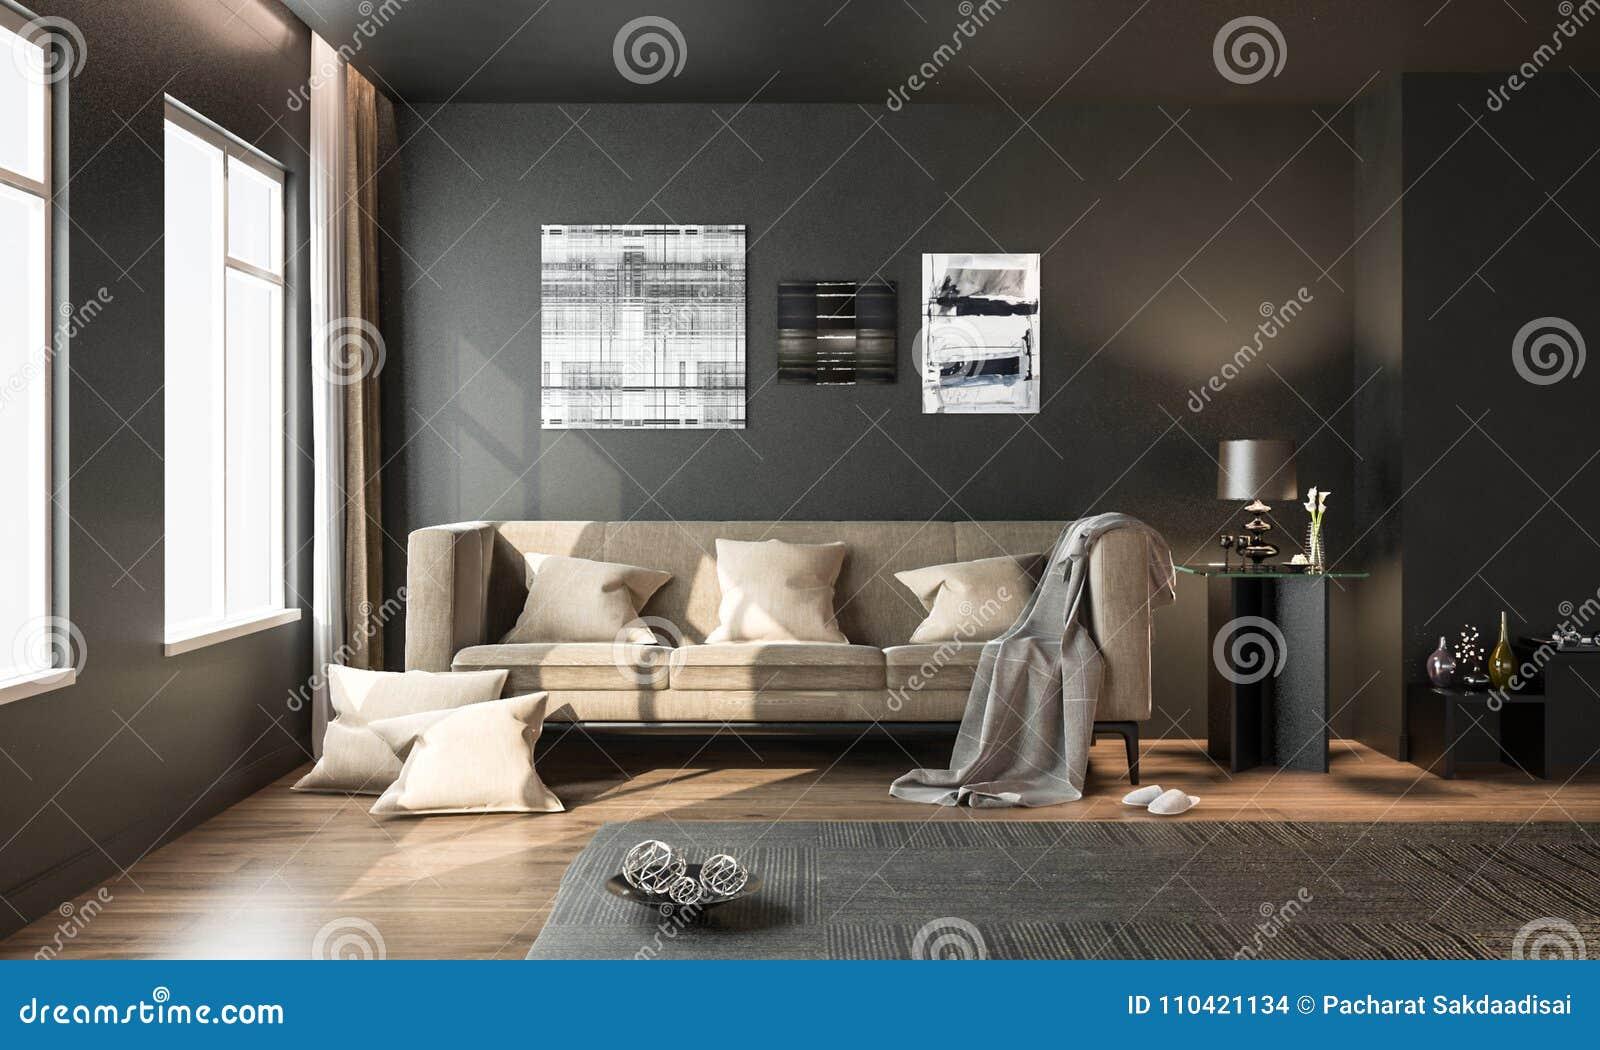 Binnenlandse woonkamer zwarte moderne stijl met bruine losse